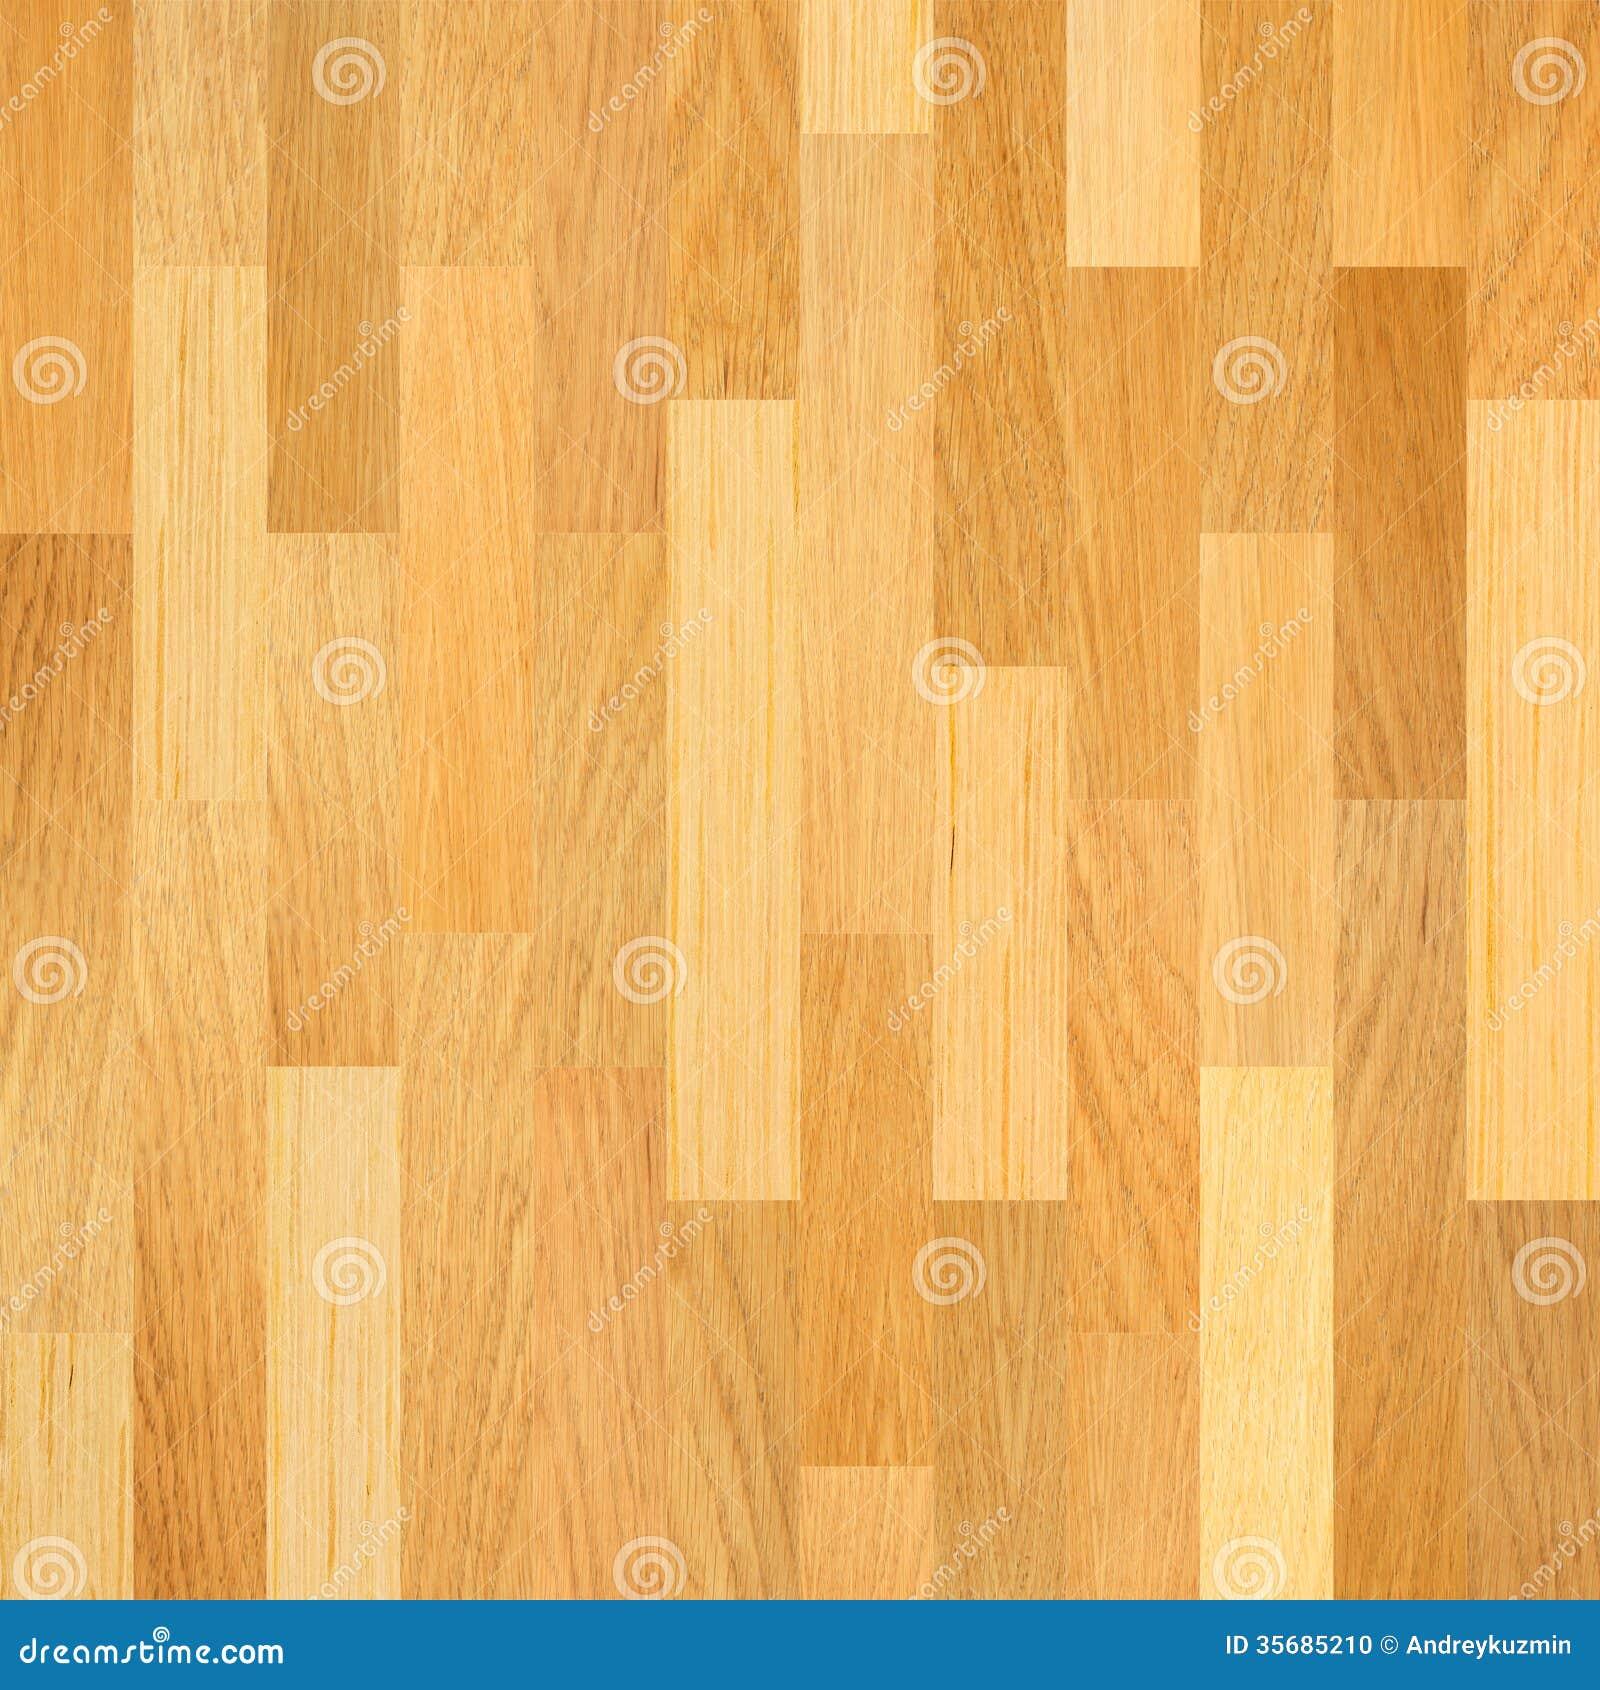 Wooden parquet flooring background stock photo image for Parquet flooring